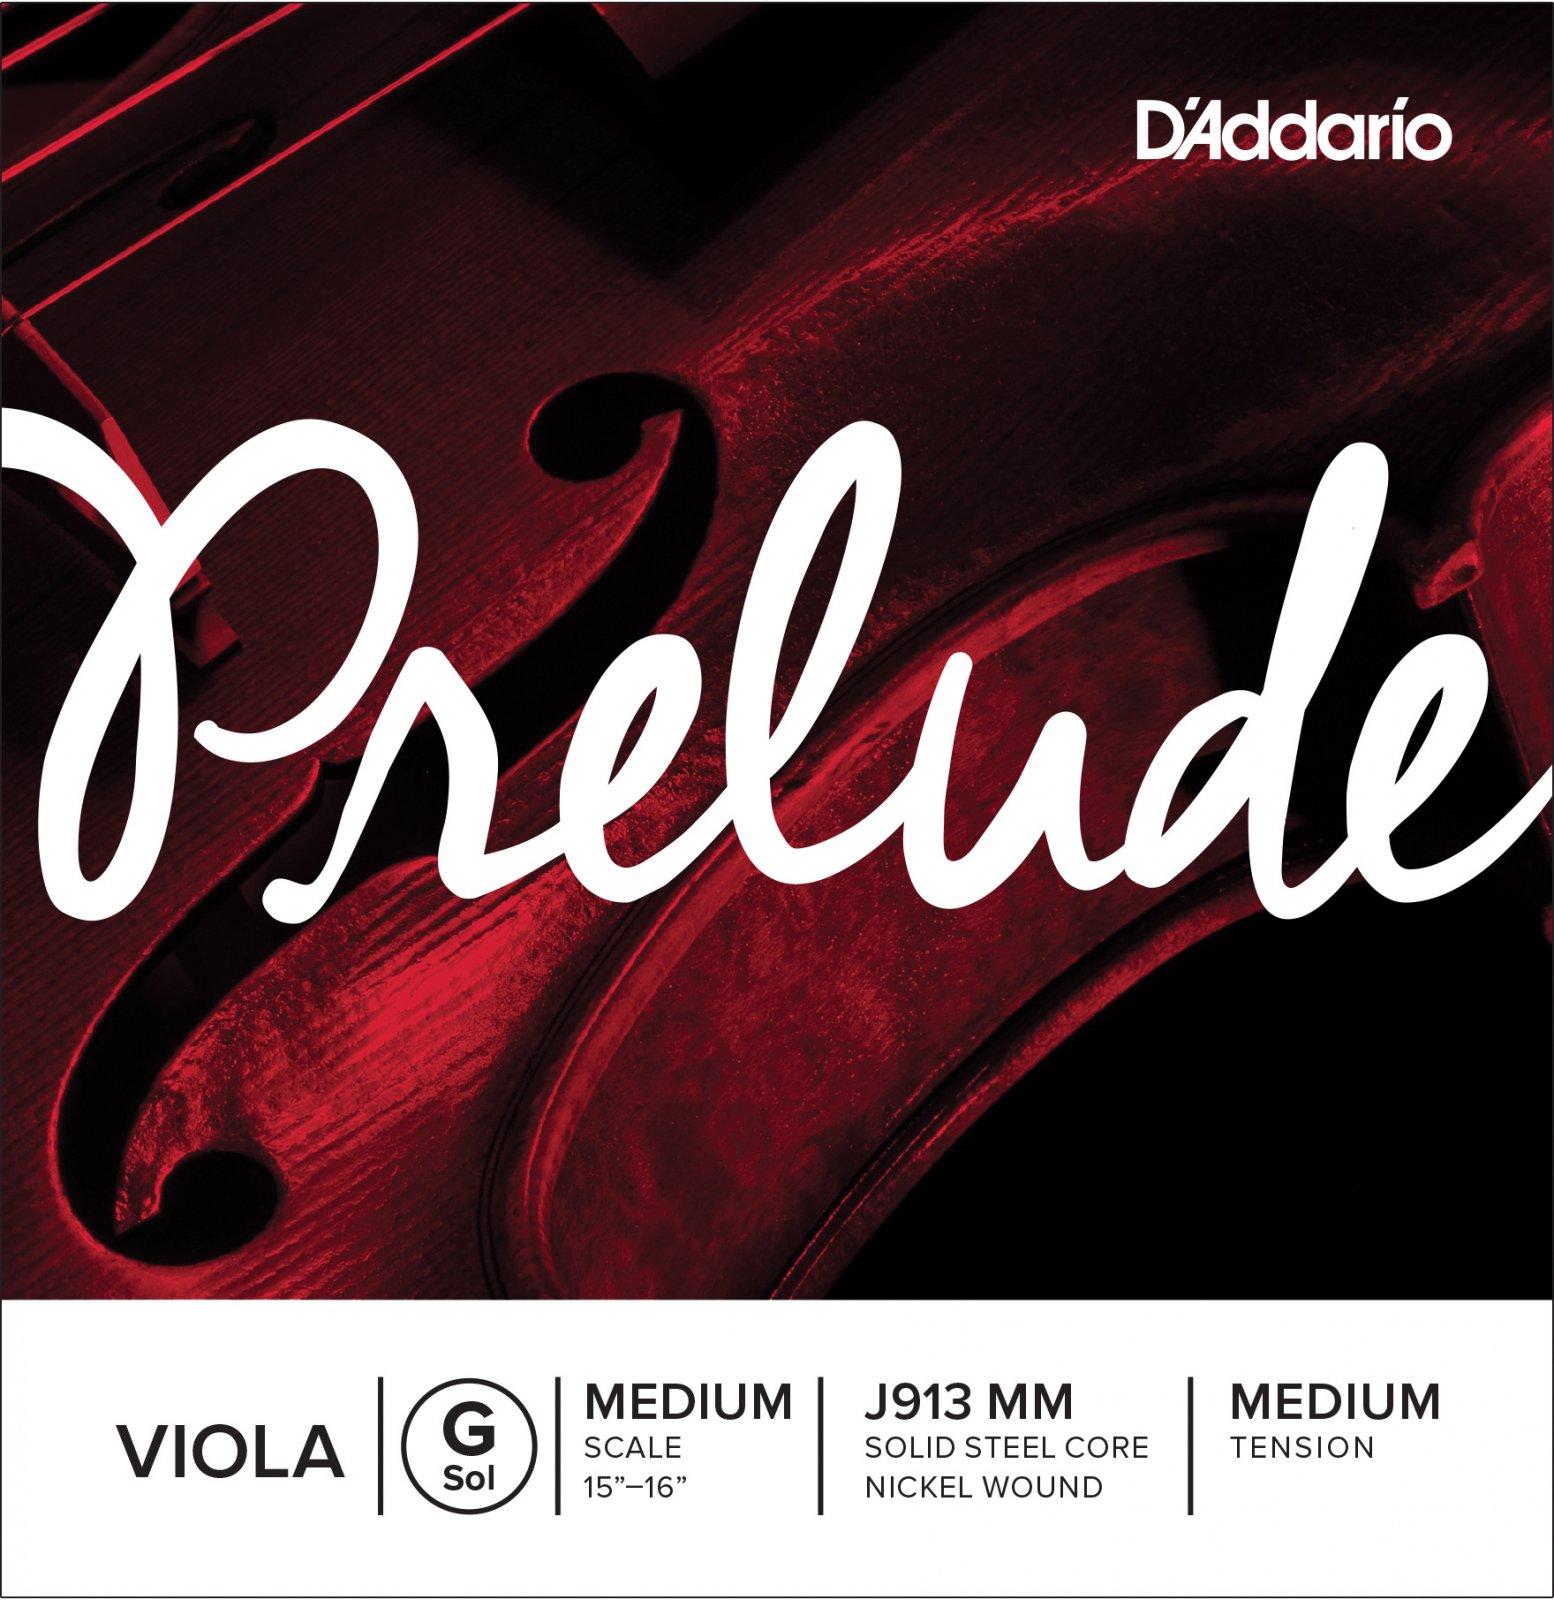 D'Addario J913MM Prelude Viola Single G String, Medium Scale, Medium Tension